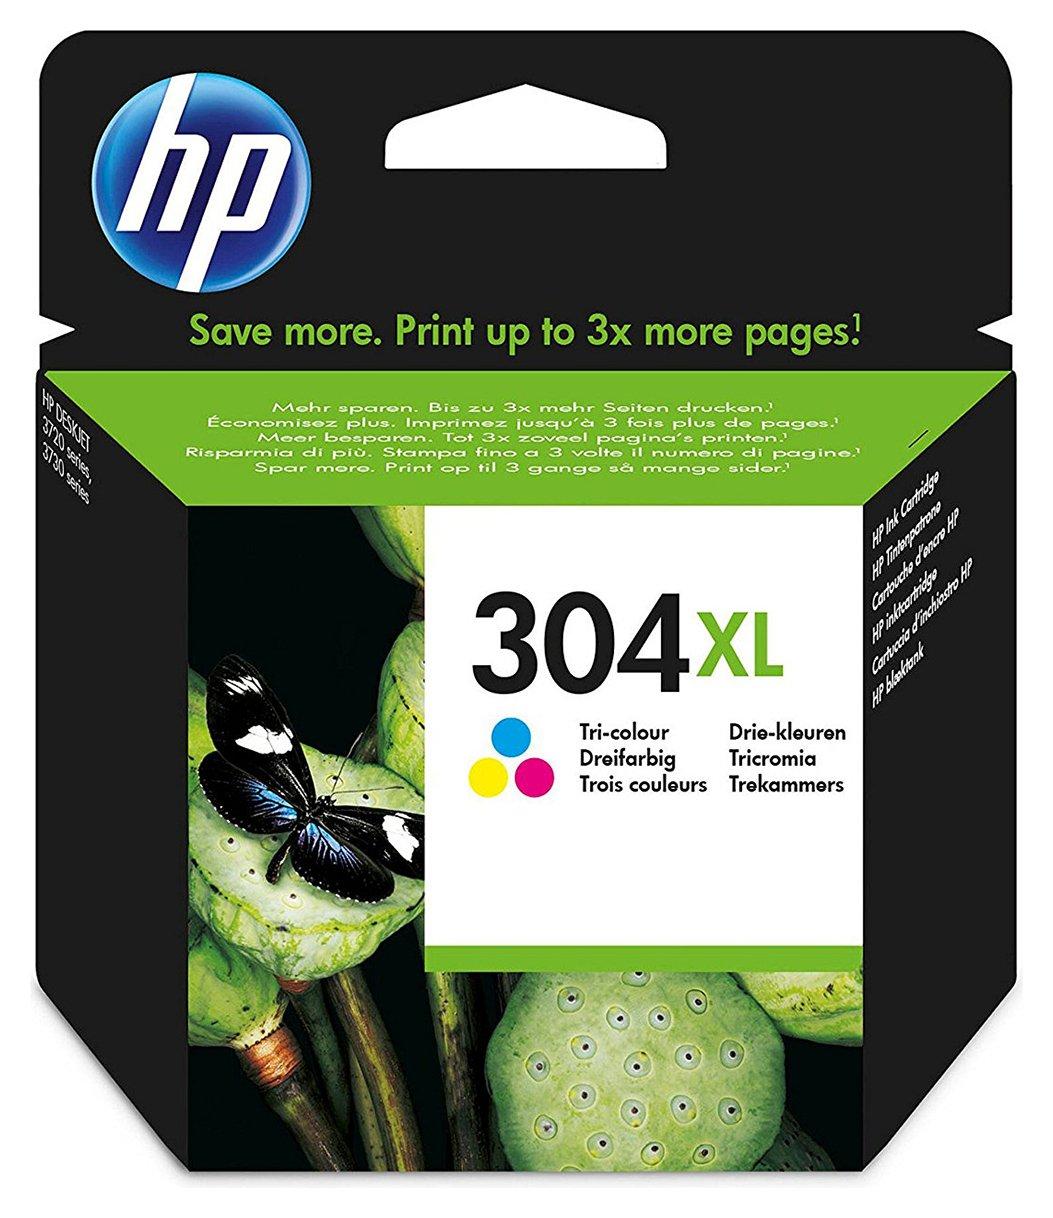 HP 304 XL Original Ink Cartridge Multi Colour Pack review